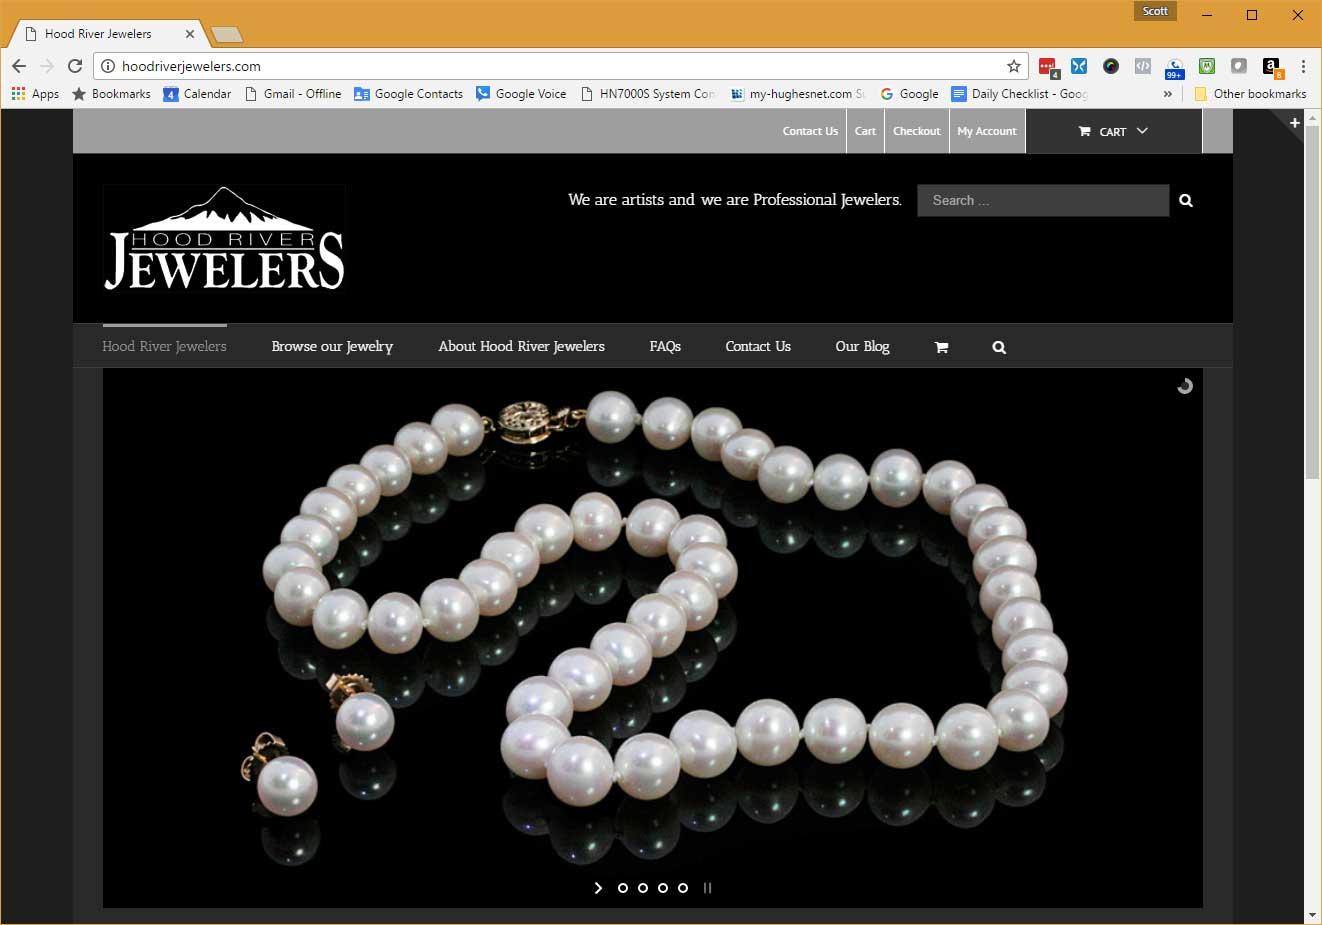 hoodriverjewelers